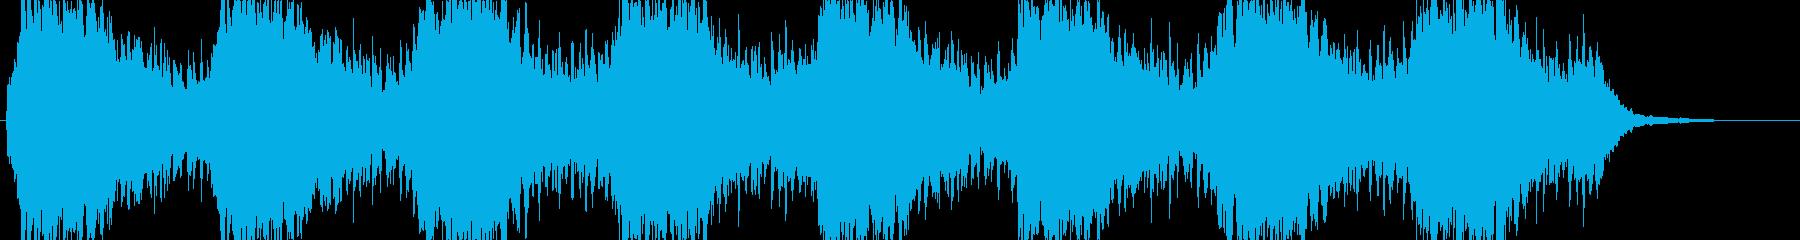 no.2「水」「水のある風景」 B8の再生済みの波形